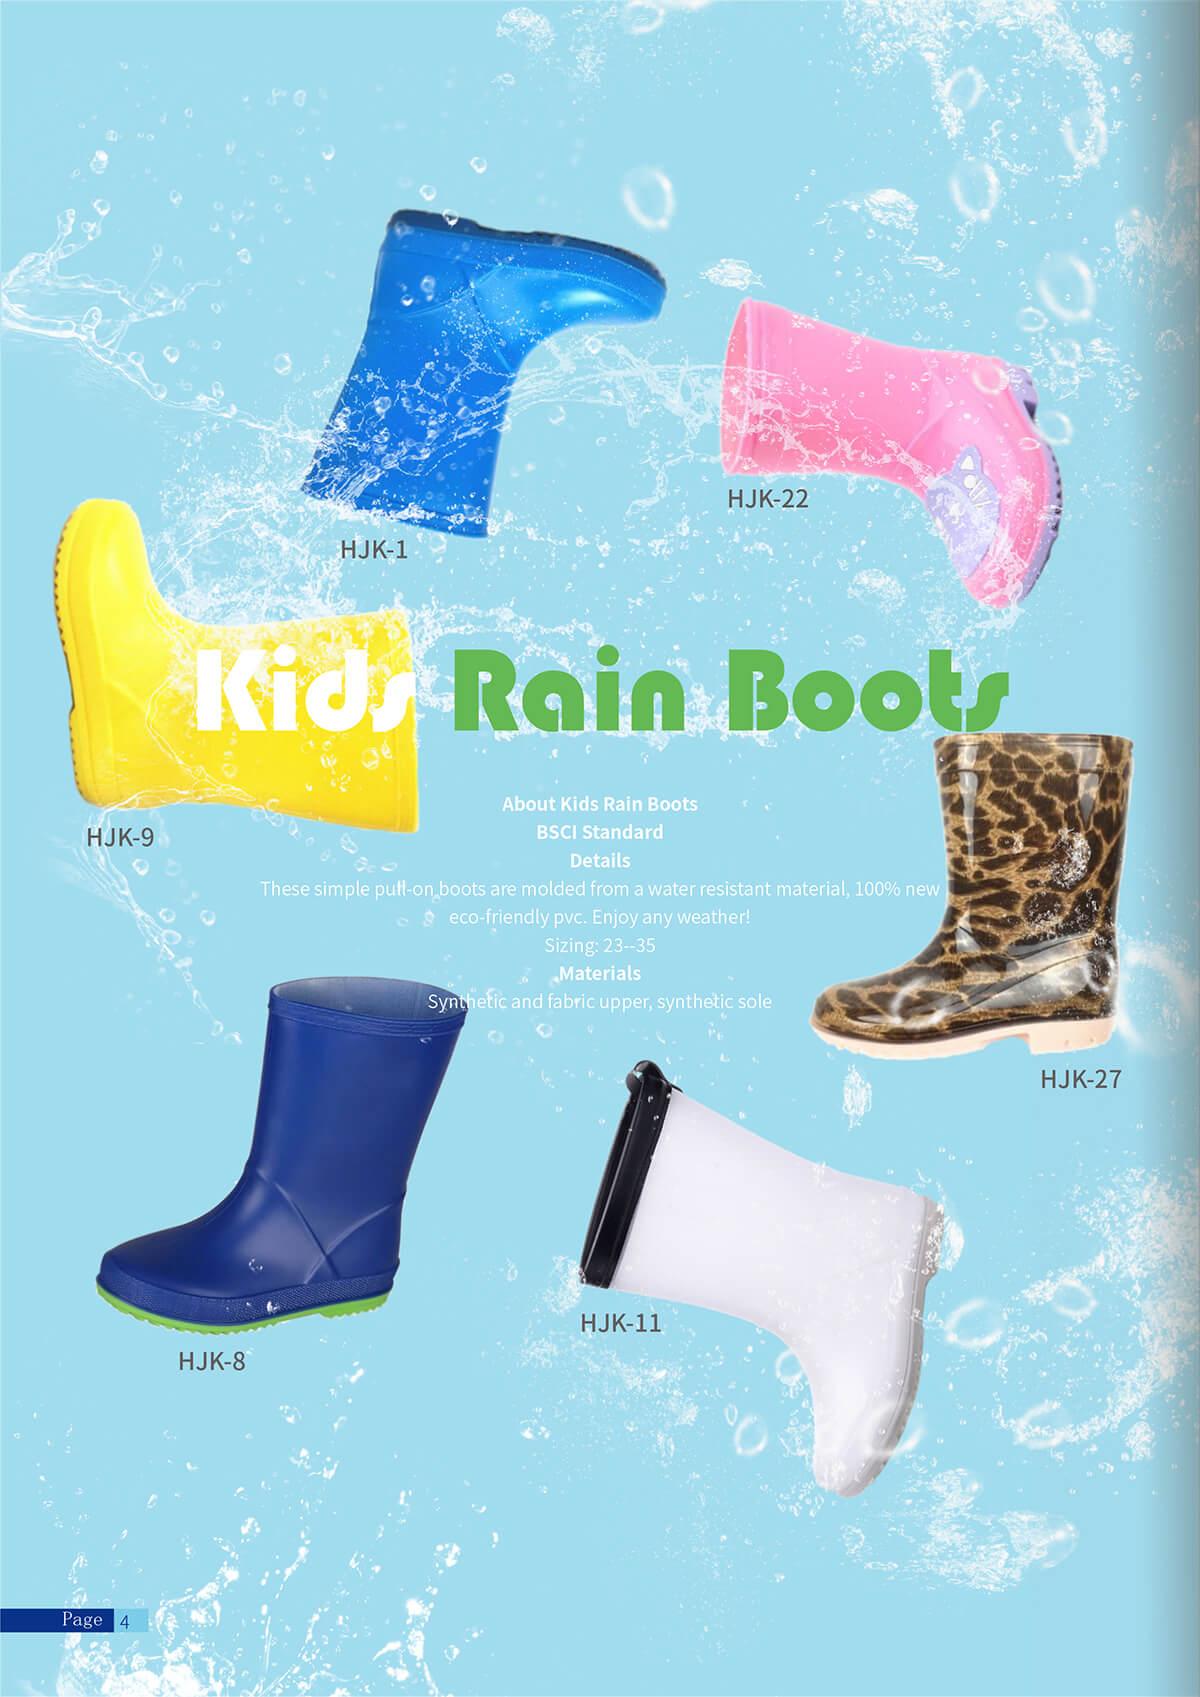 lambo rain boots catalog 4